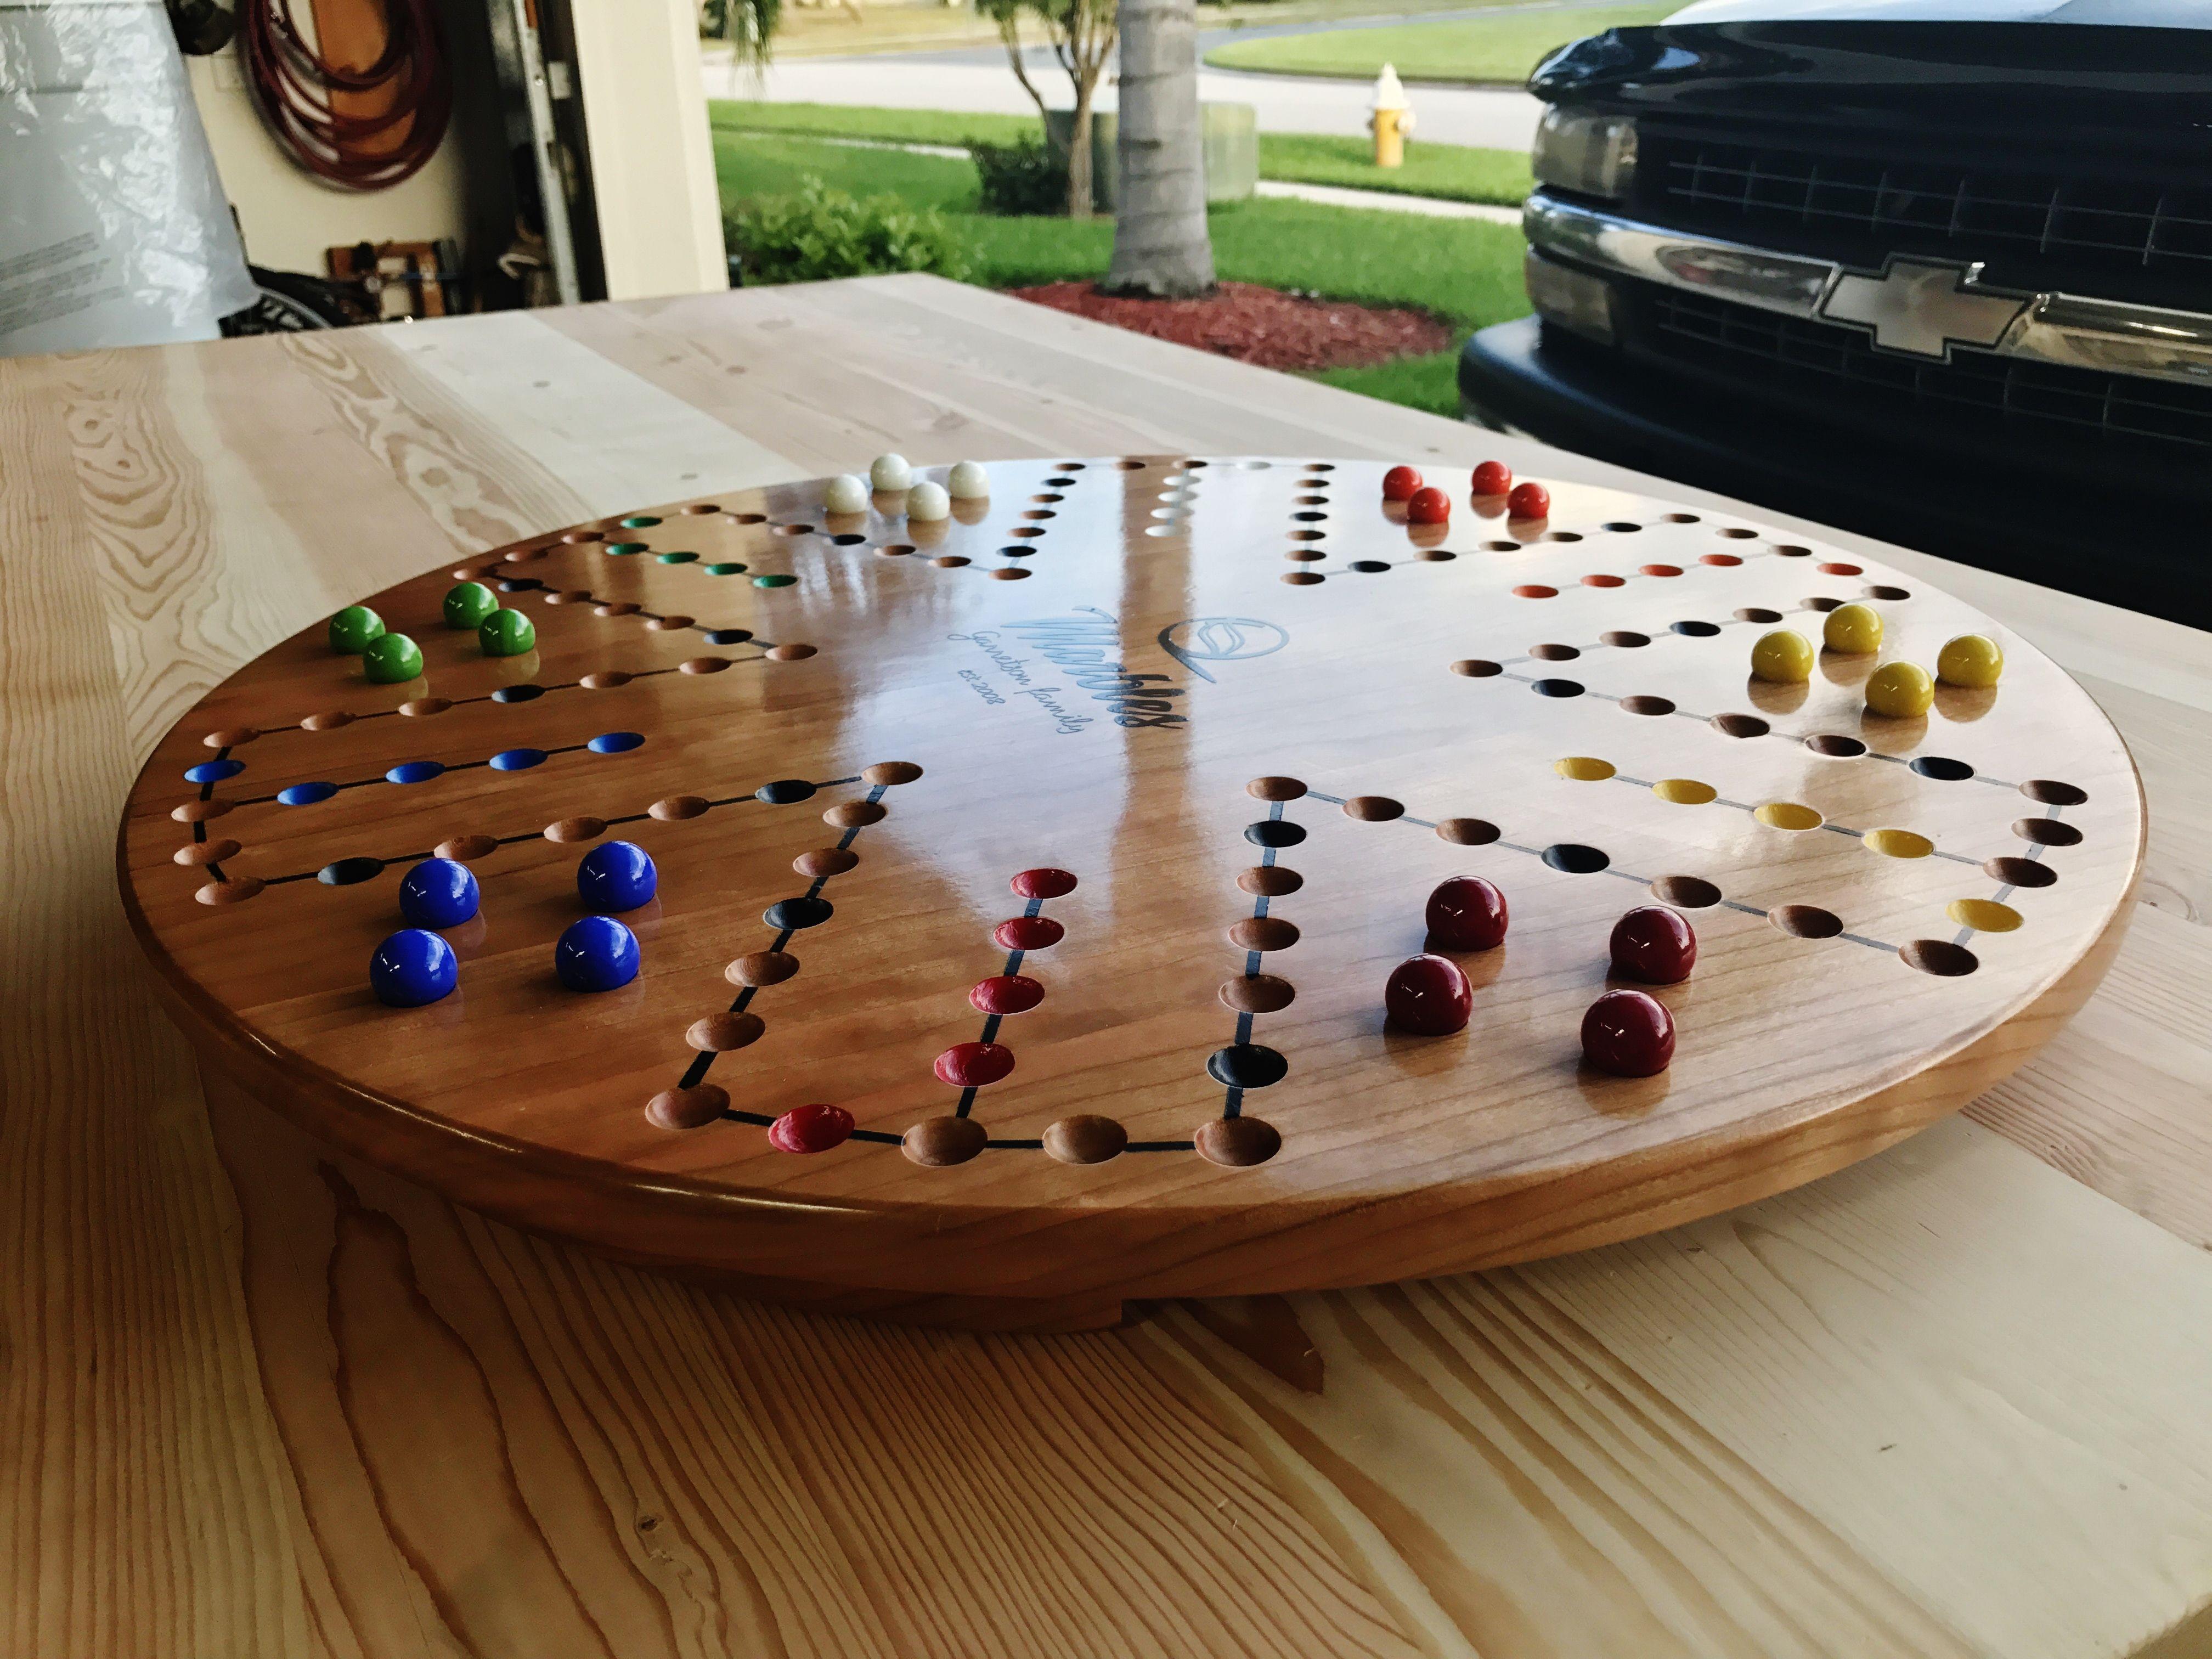 Aggravation board game board games diy homemade board